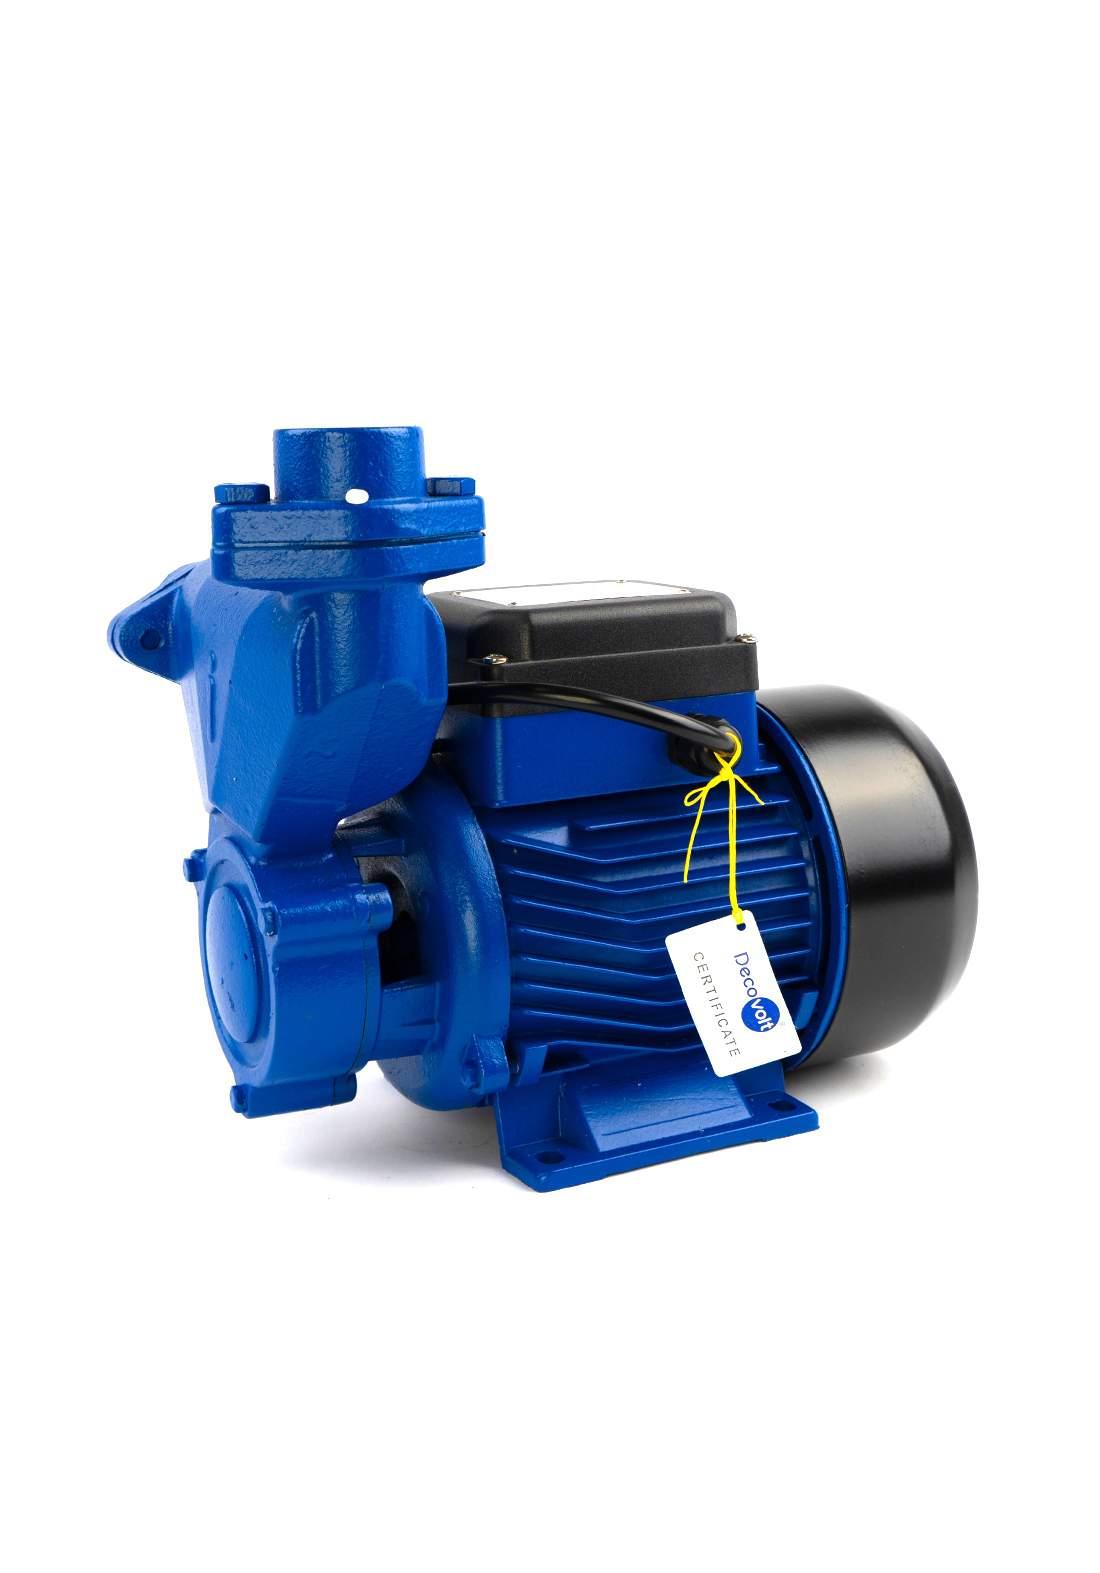 DecoVolt 4888 water pump 220w مضخة مياه 220 واط